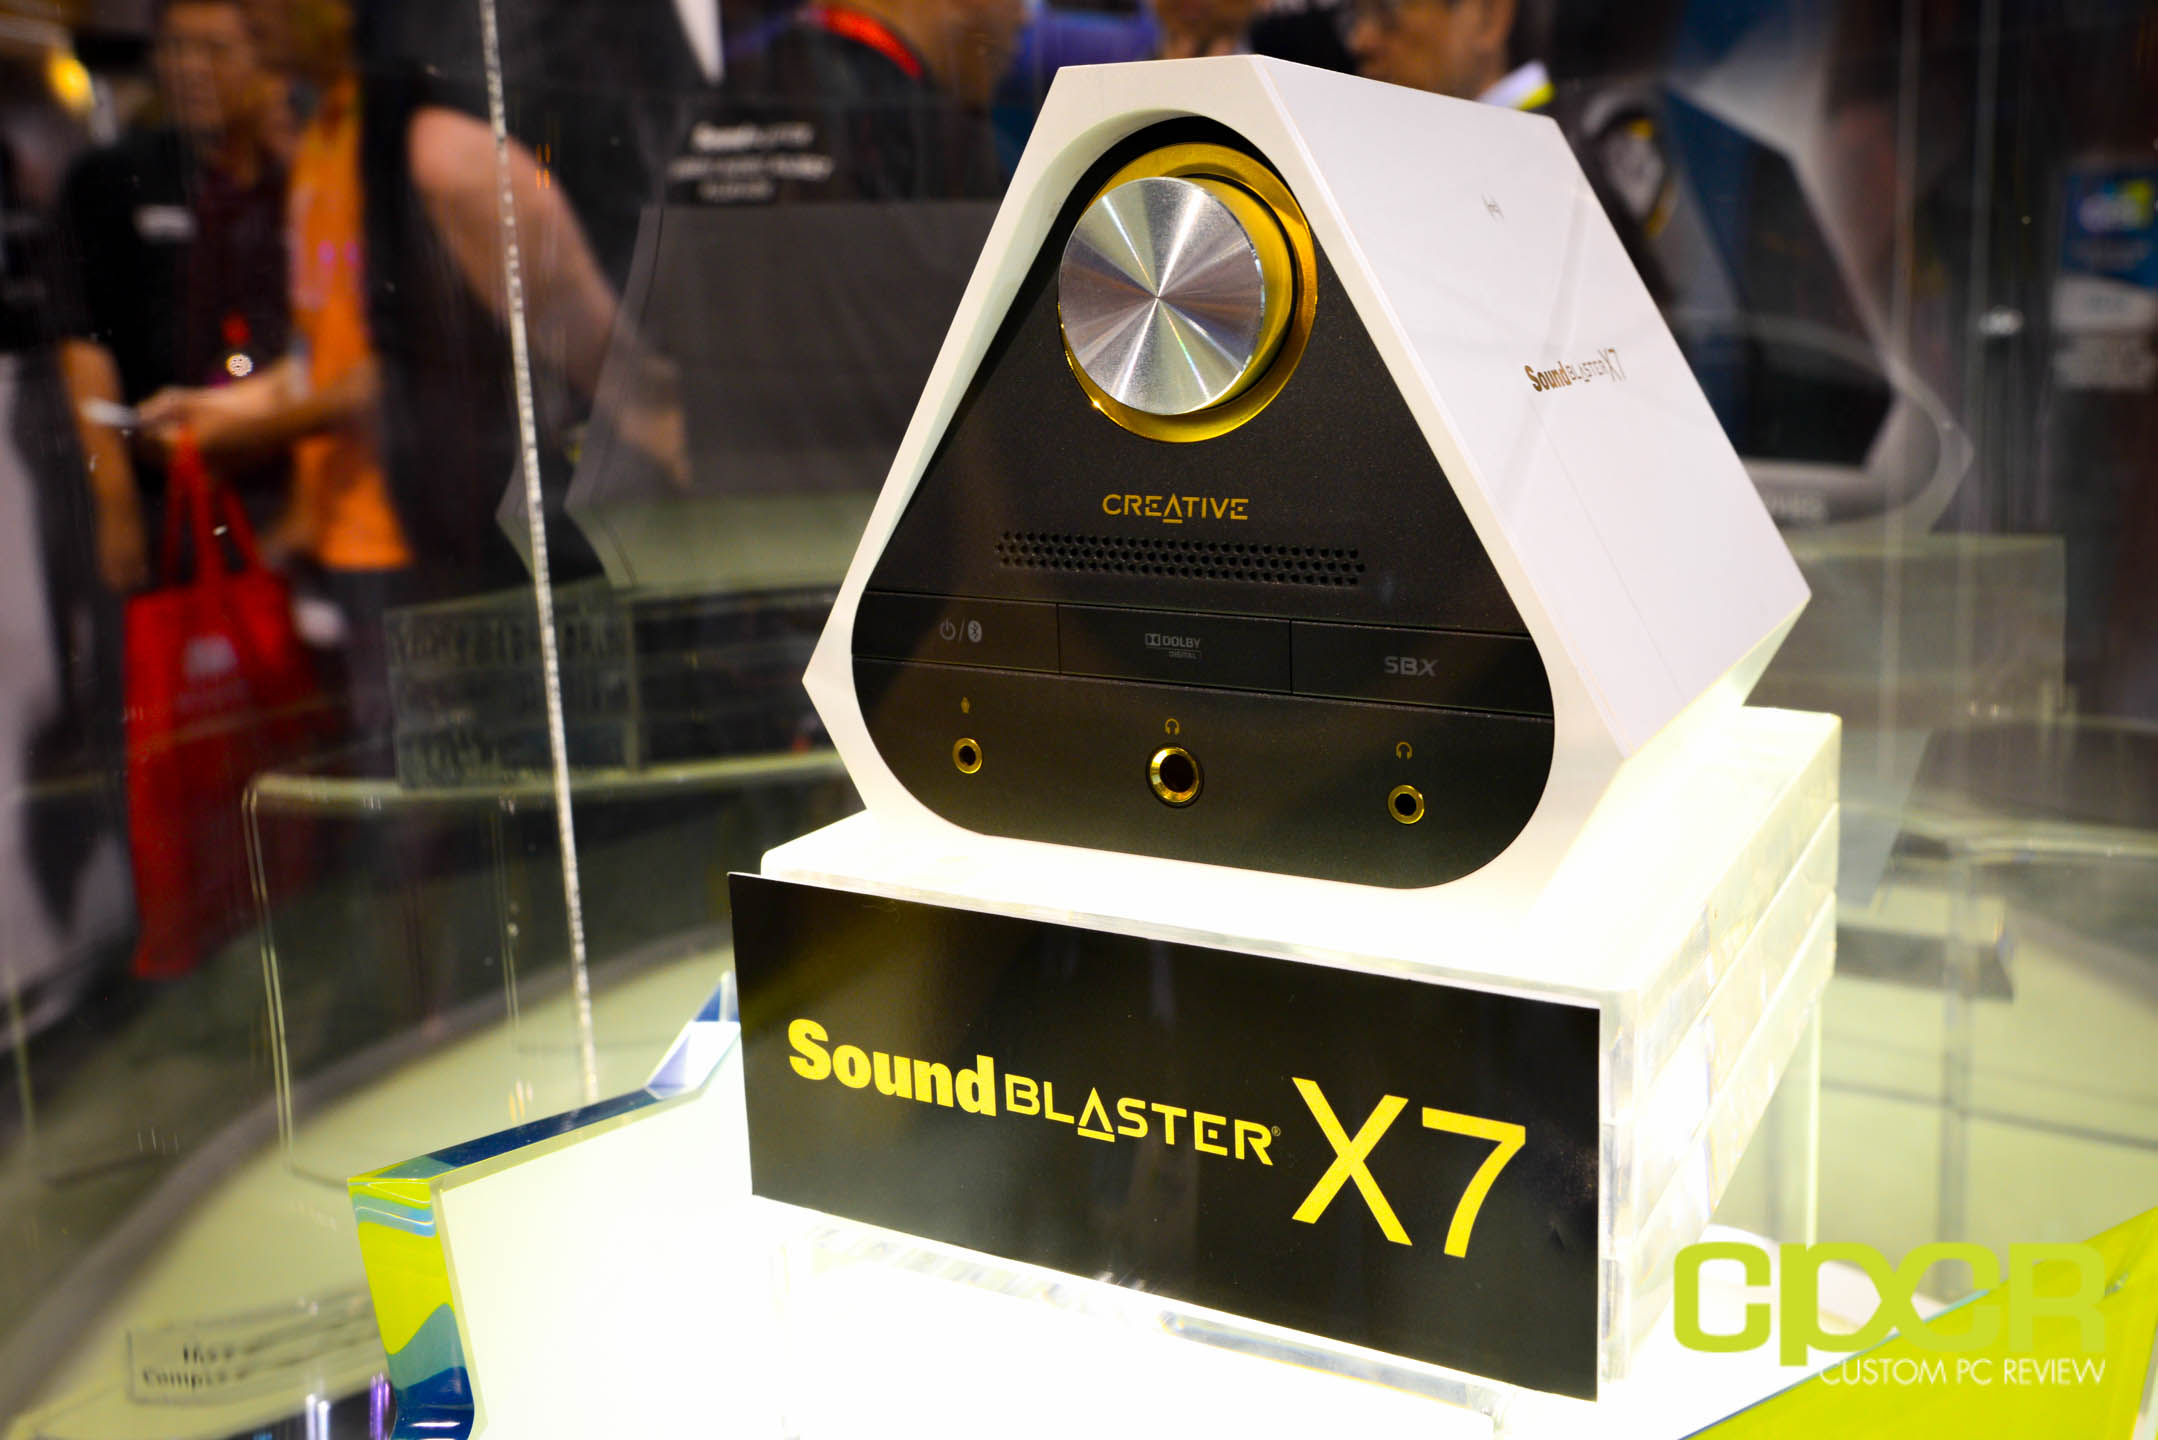 CREATIVE SOUND BLASTER X7 LIMITED EDITION WINDOWS 8.1 DRIVER